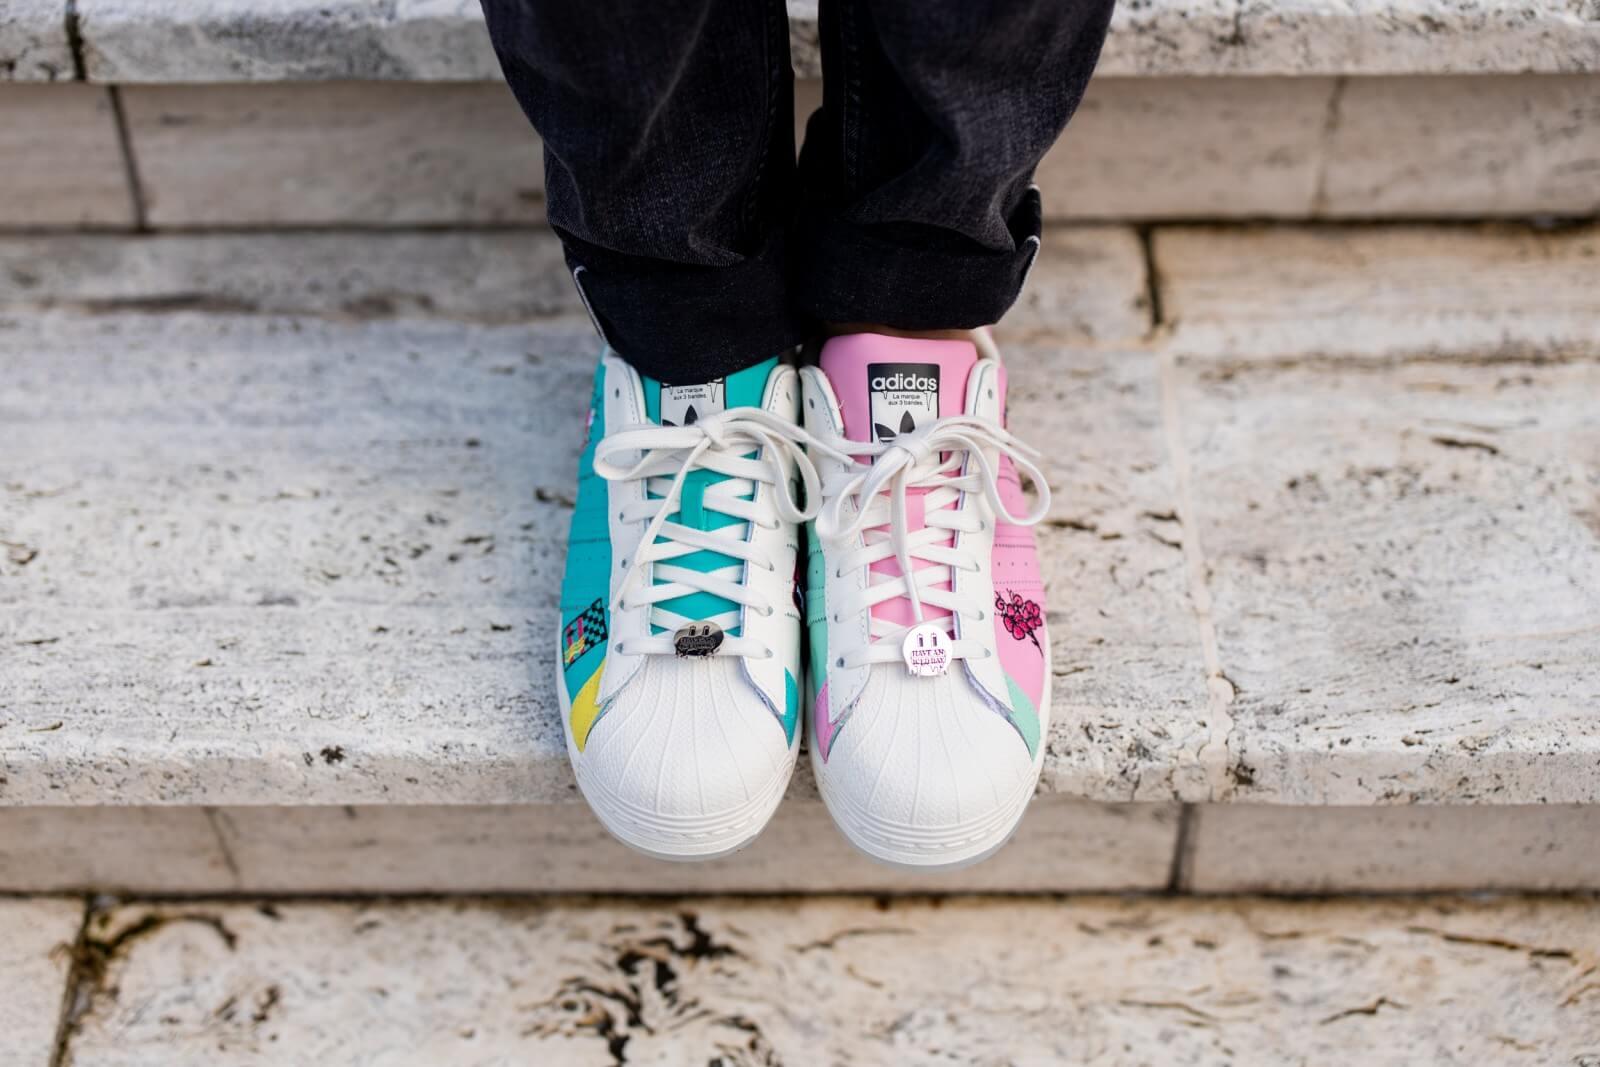 Adidas x Arizona Ice Tea Superstar Chalk White/Mutlicolor